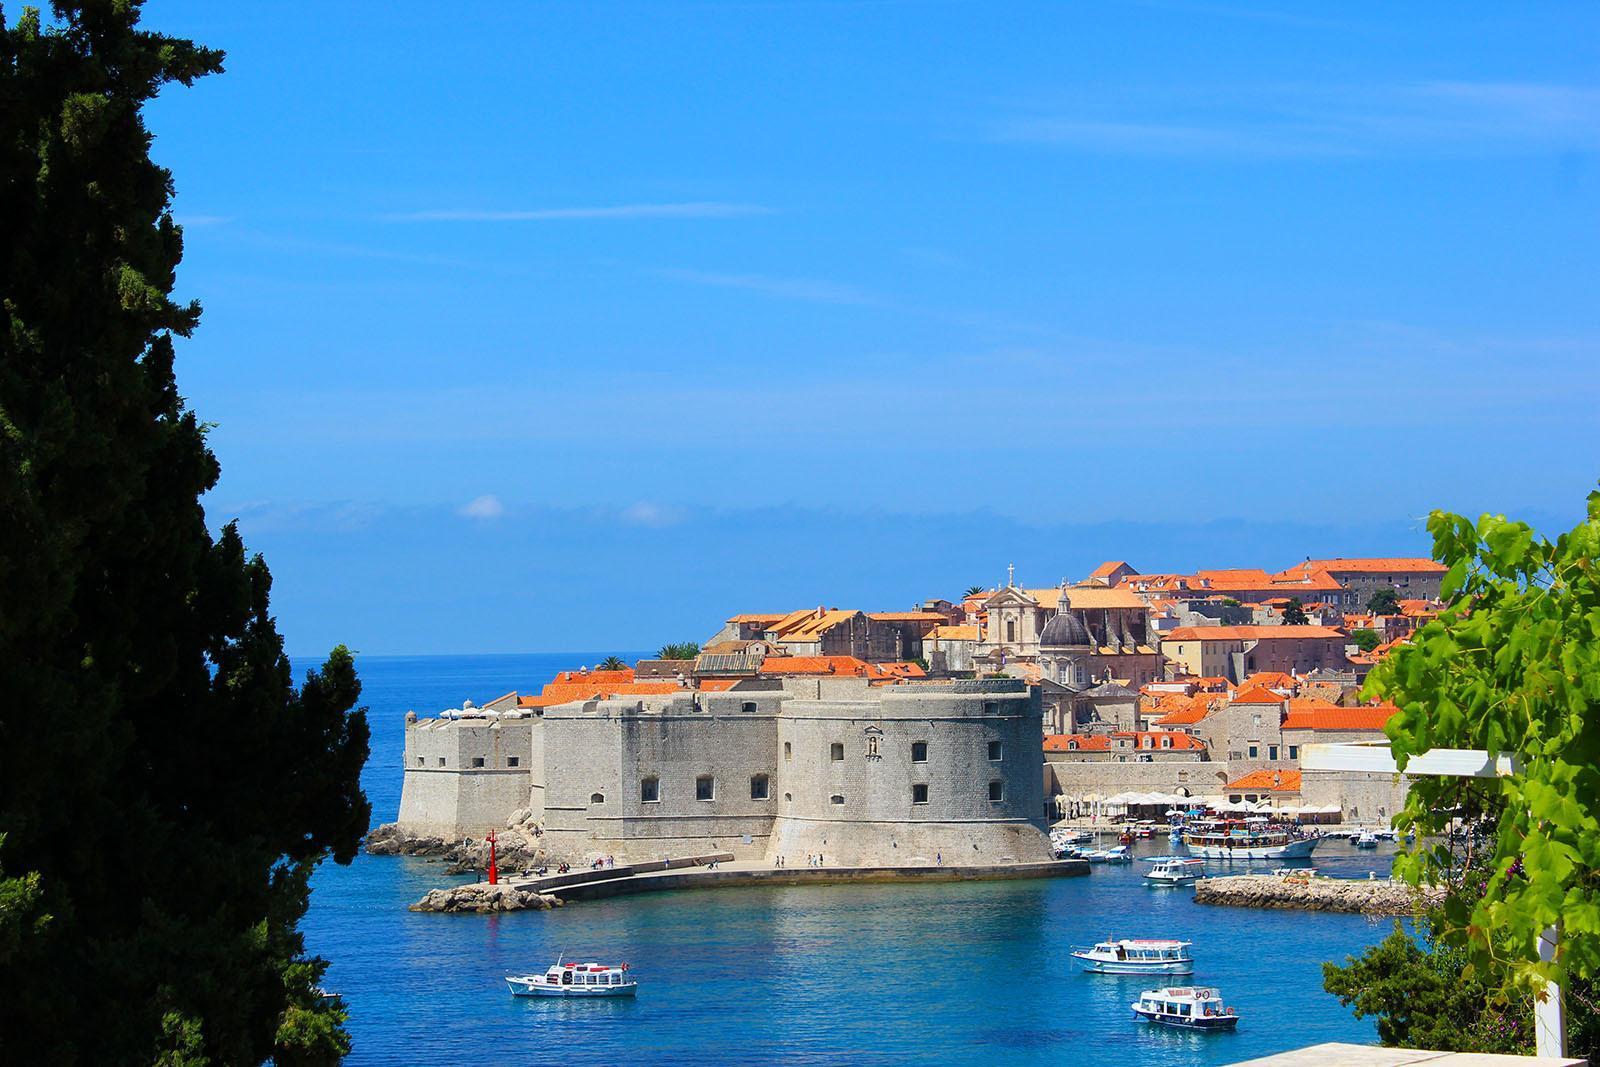 Summer in Dubrovnik : Maintain Your Sanity in Peak Season - go dubrovnik